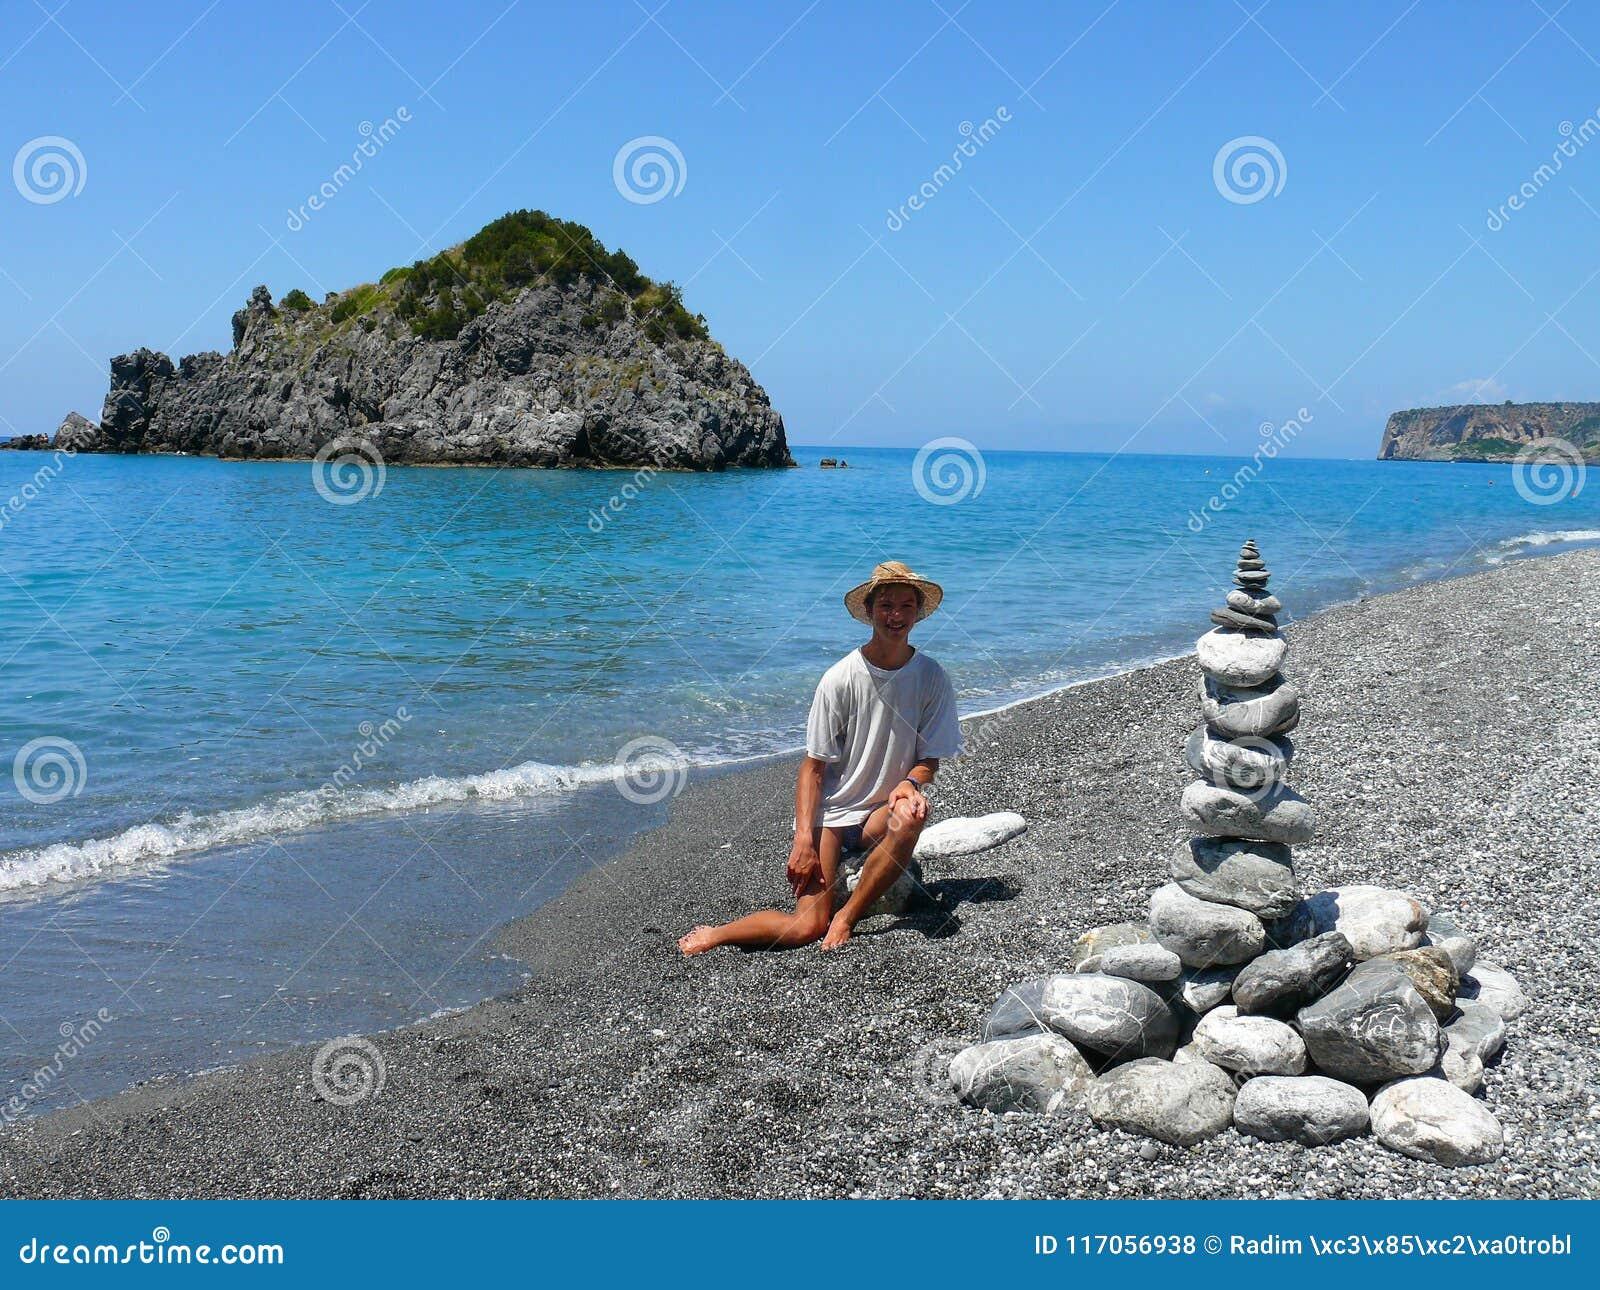 Land-art on Calabrian beach